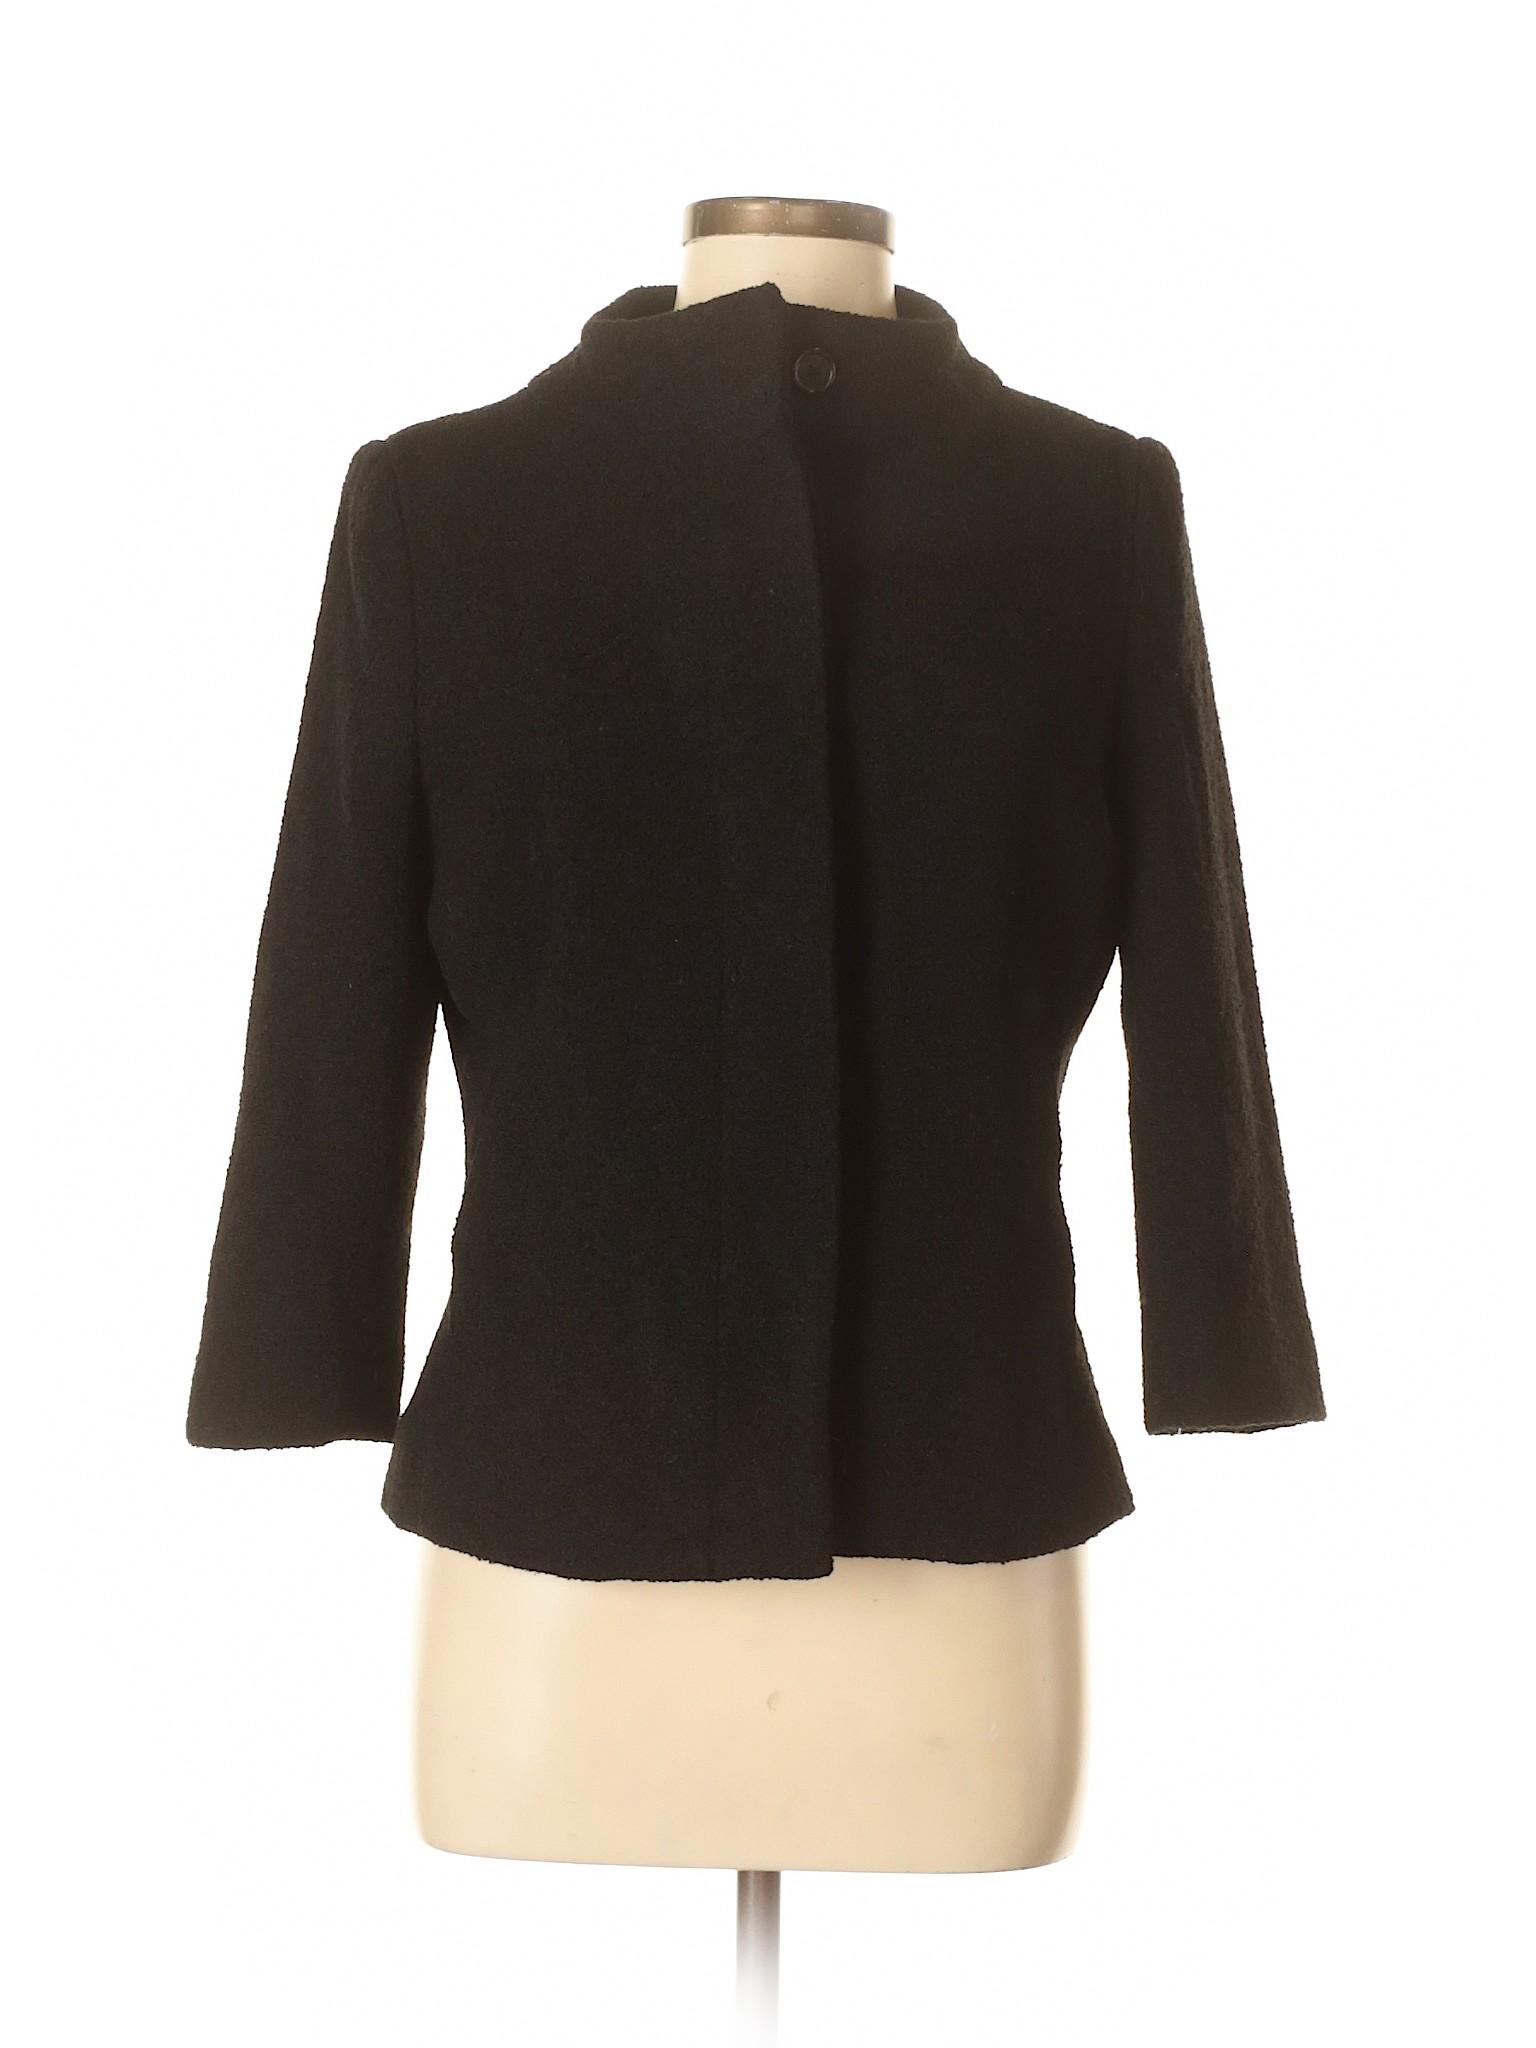 Target Mizrahi leisure for Coat Boutique Isaac E0qB8IwxwO